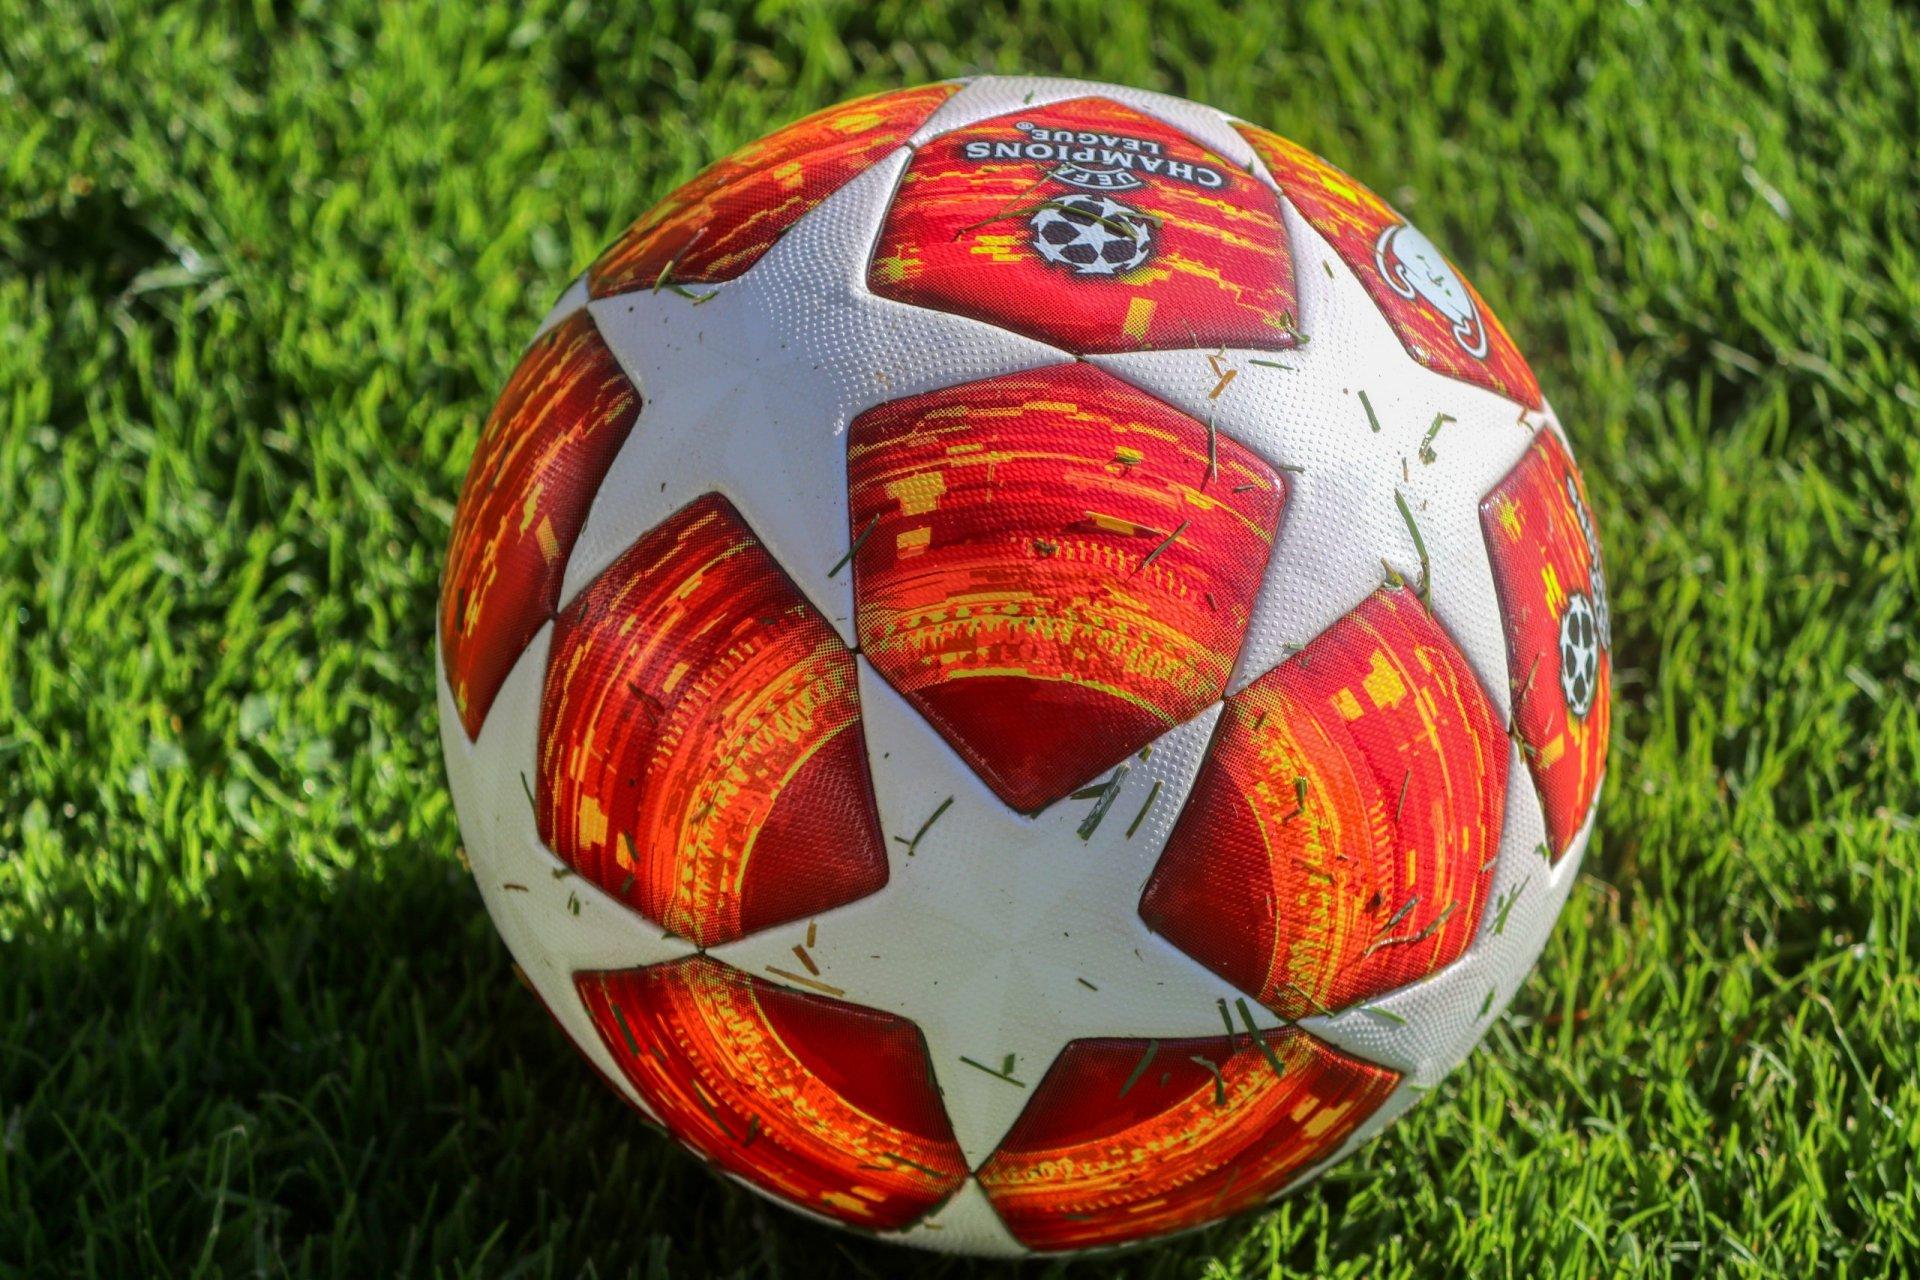 Adidas Champions League Official Matchball 2019/2020